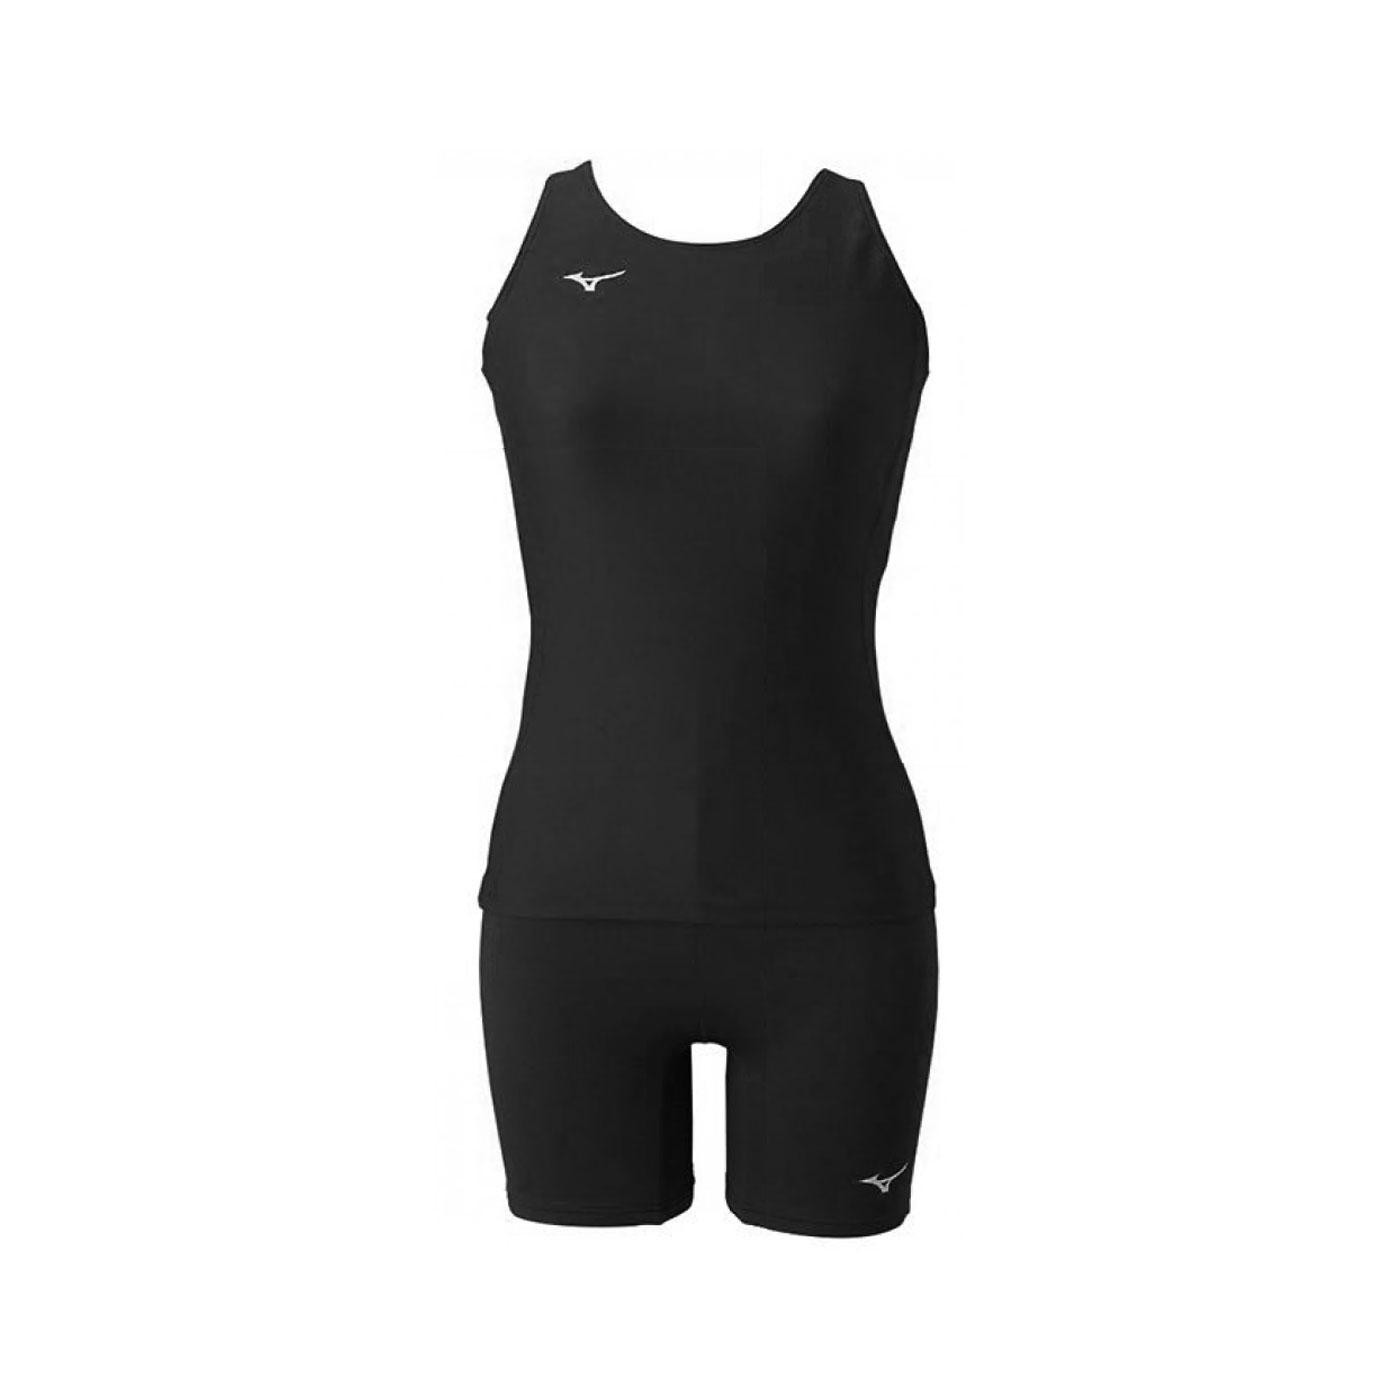 MIZUNO 女款兩件式泳衣 N2MG1C0109 - 黑銀